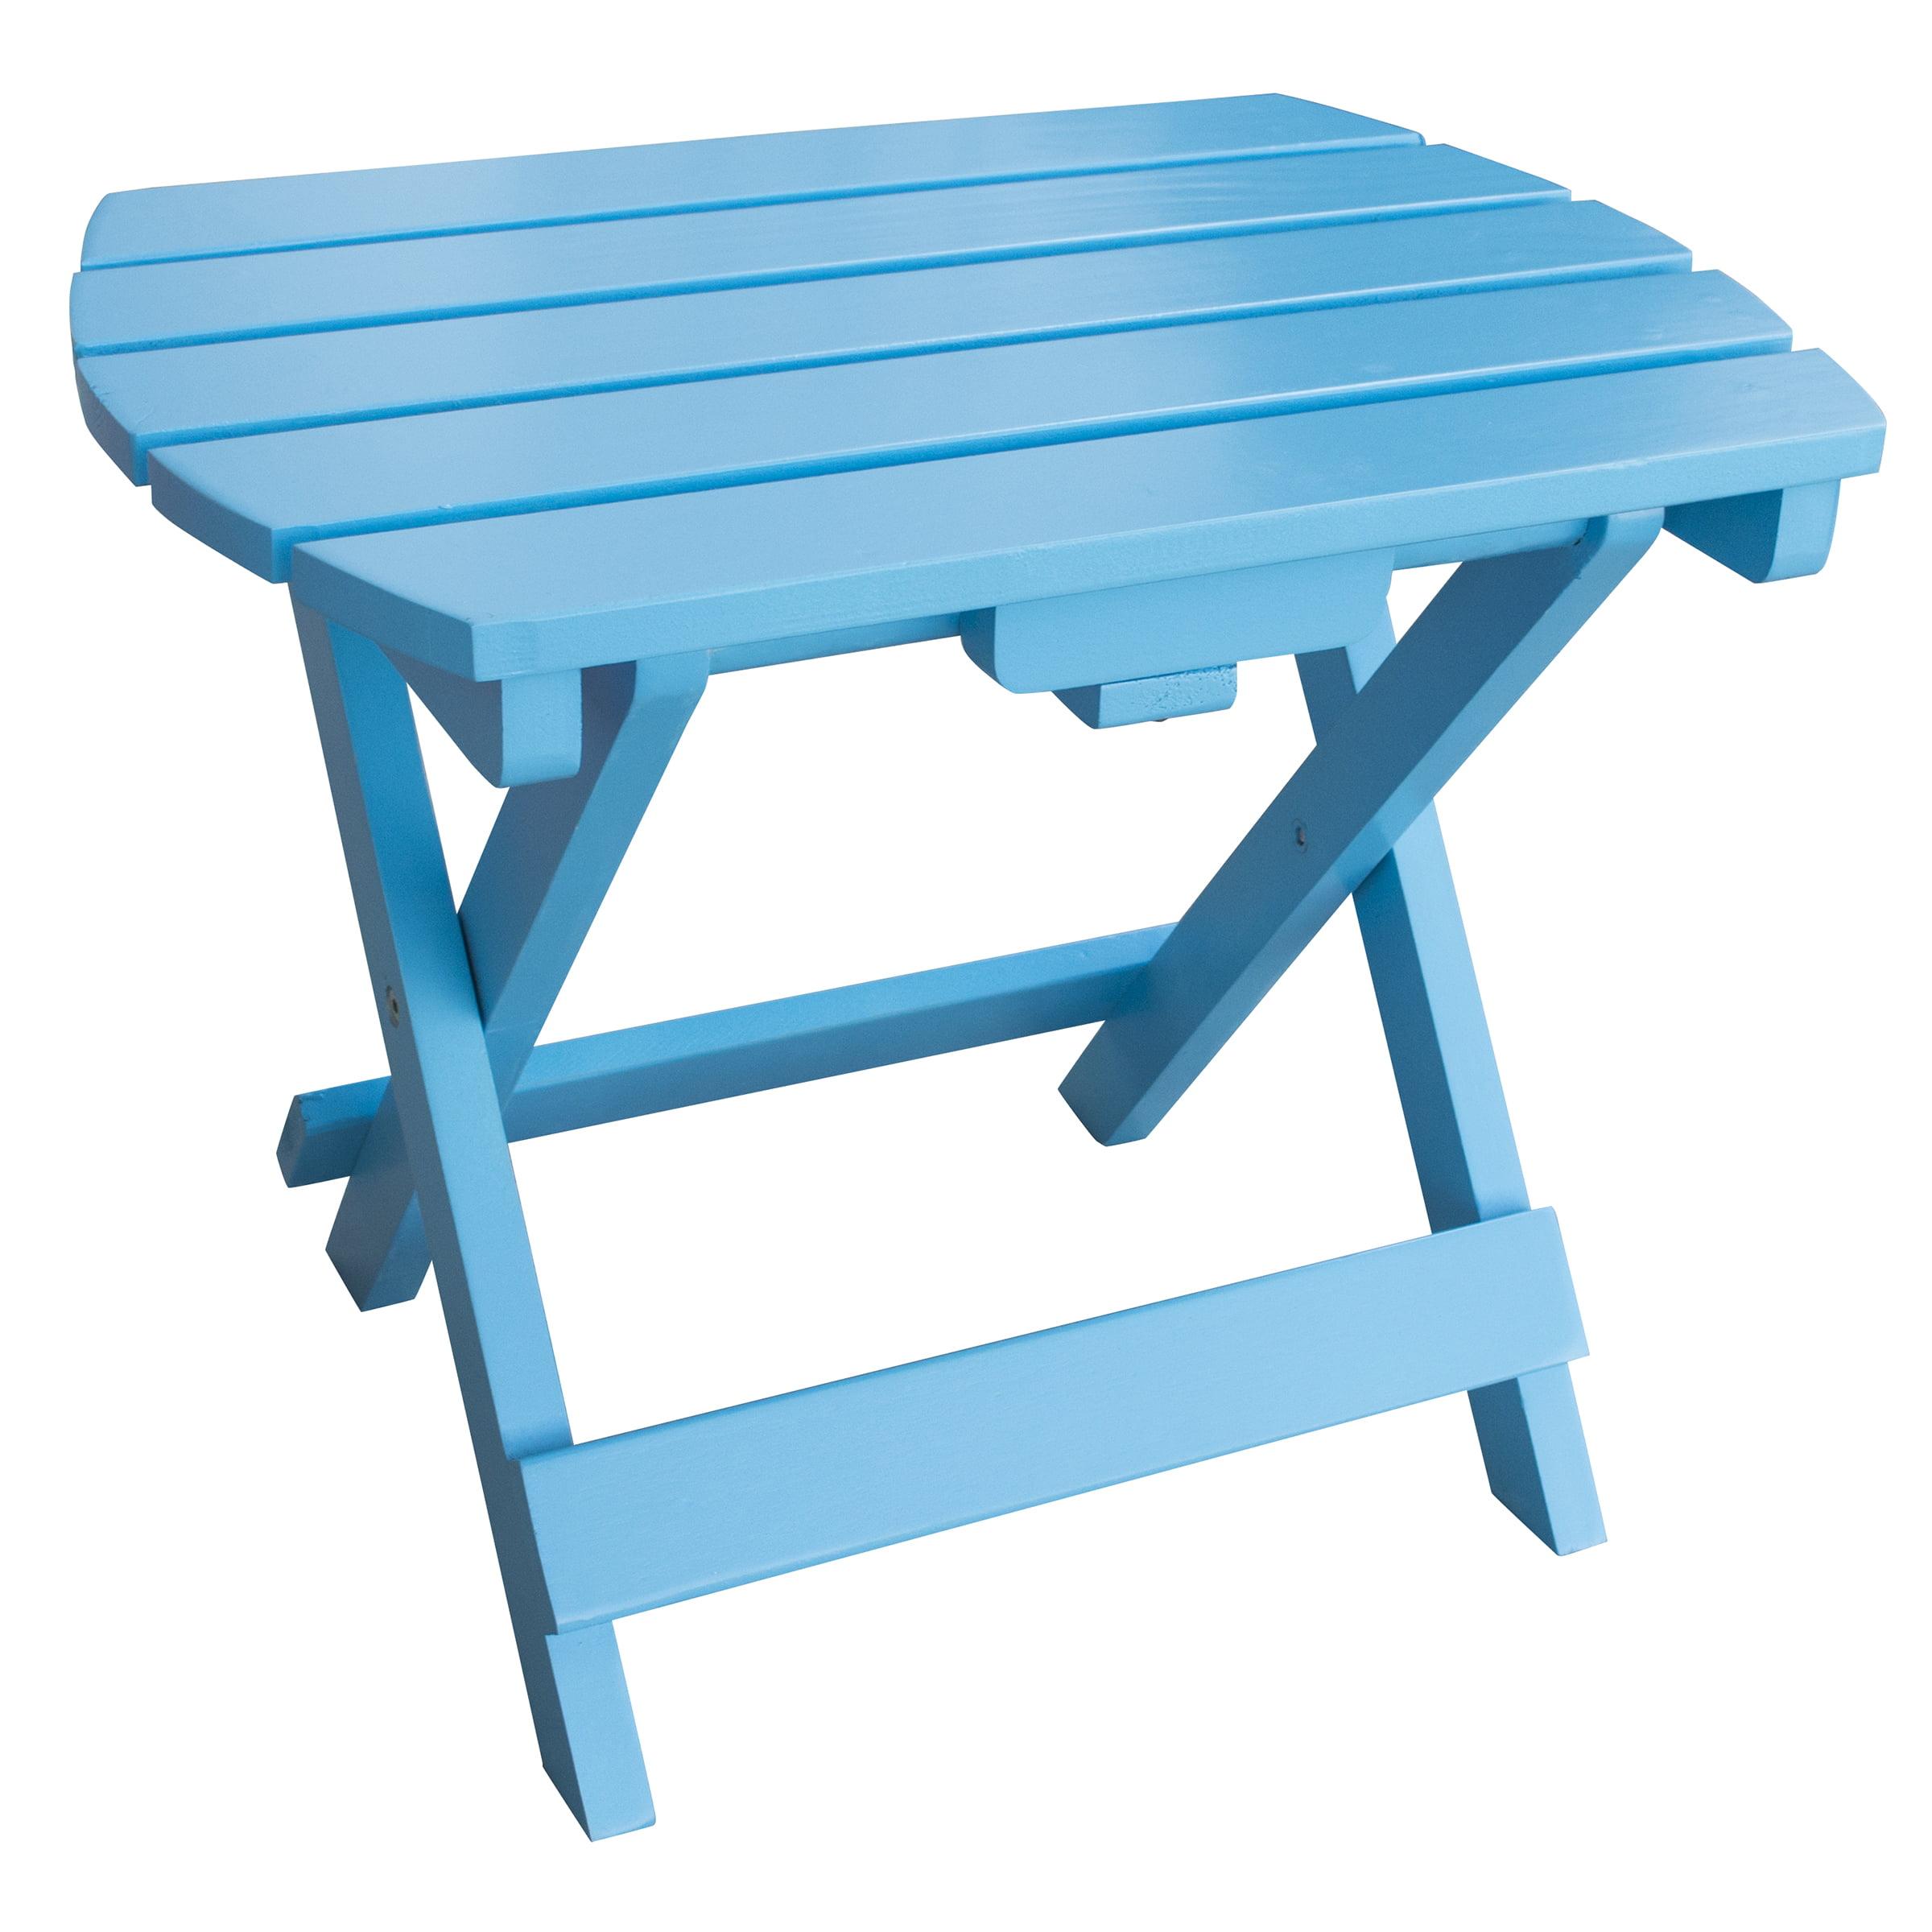 AmeriHome Solid Wood Adirondack Folding Side Table with Painted Finish Aruba Blue by Buffalo Corp